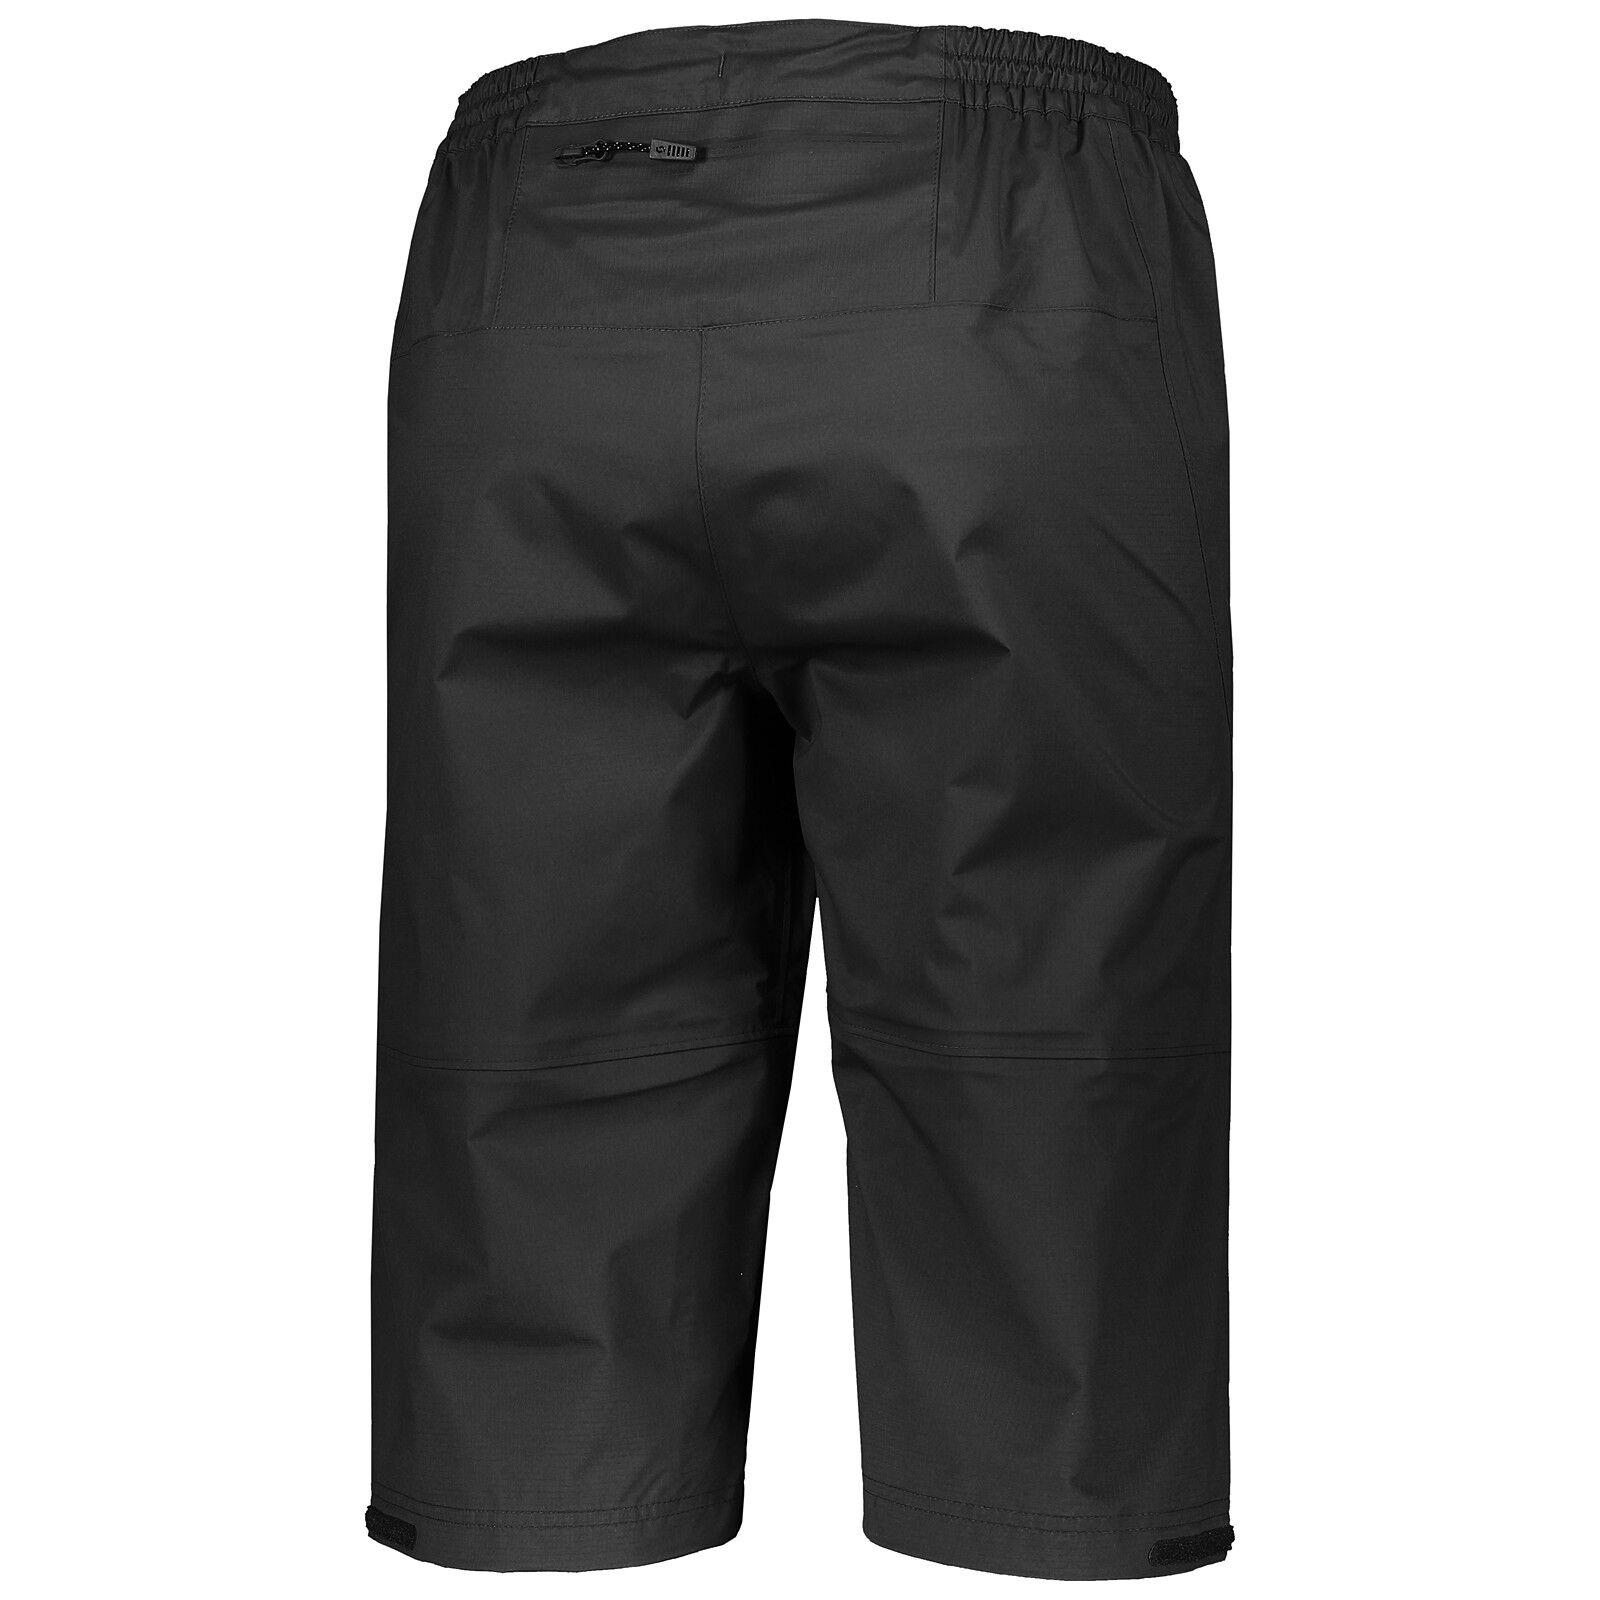 Scott Trail MTN Dryo 50 Fahrrad Regenshort Hose Hose Hose kurz schwarz 2019 a55dfc